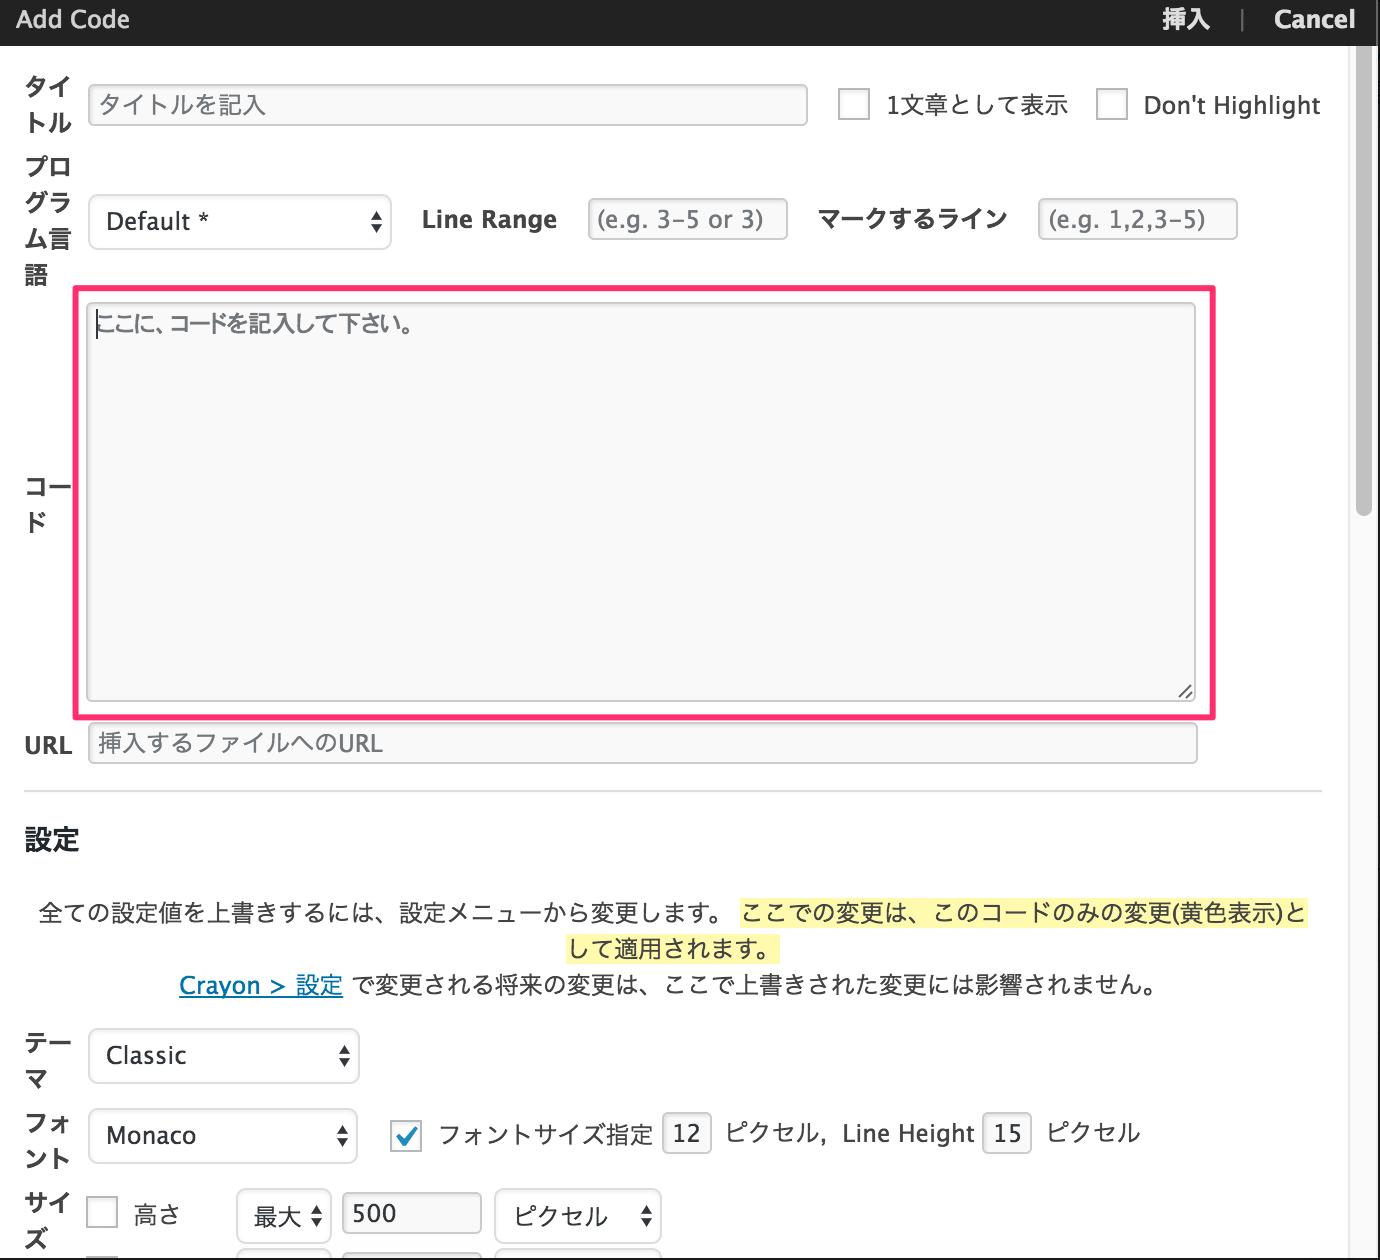 Add_Code